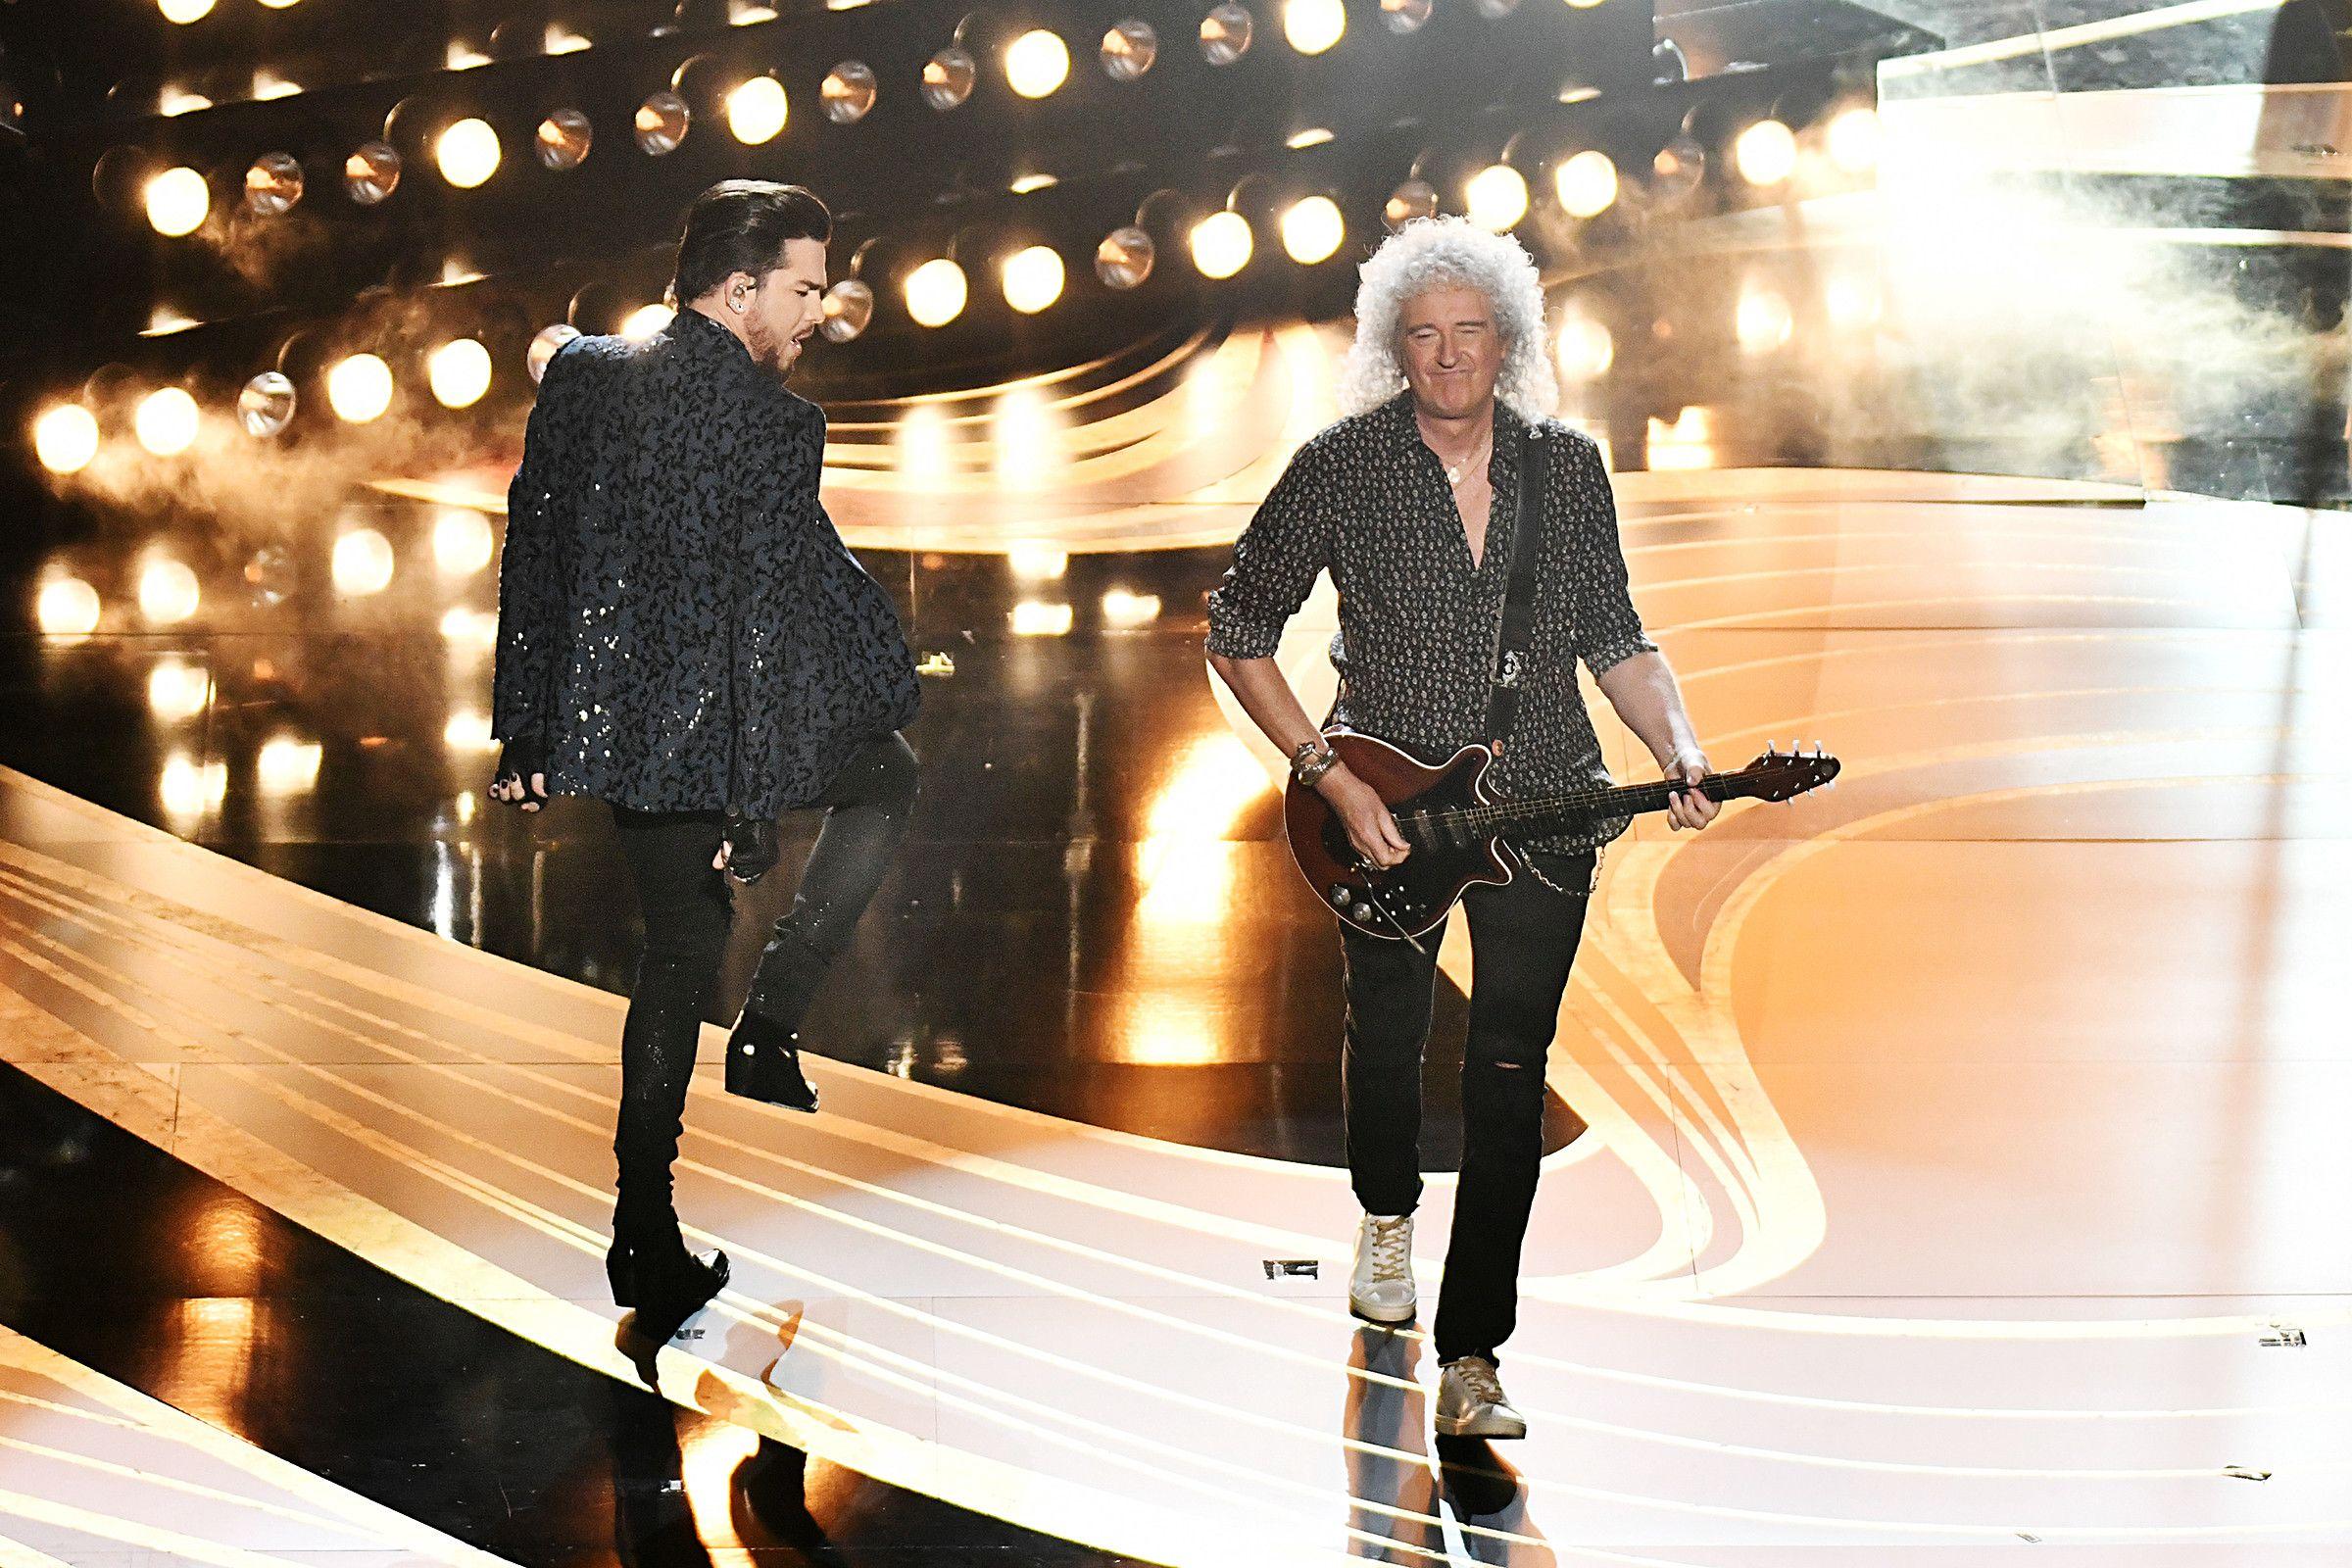 Oscars 2019 Queen Adam Lambert Open Show With Pair Of Hits Adam Lambert Queen Brian May Bryan Singer